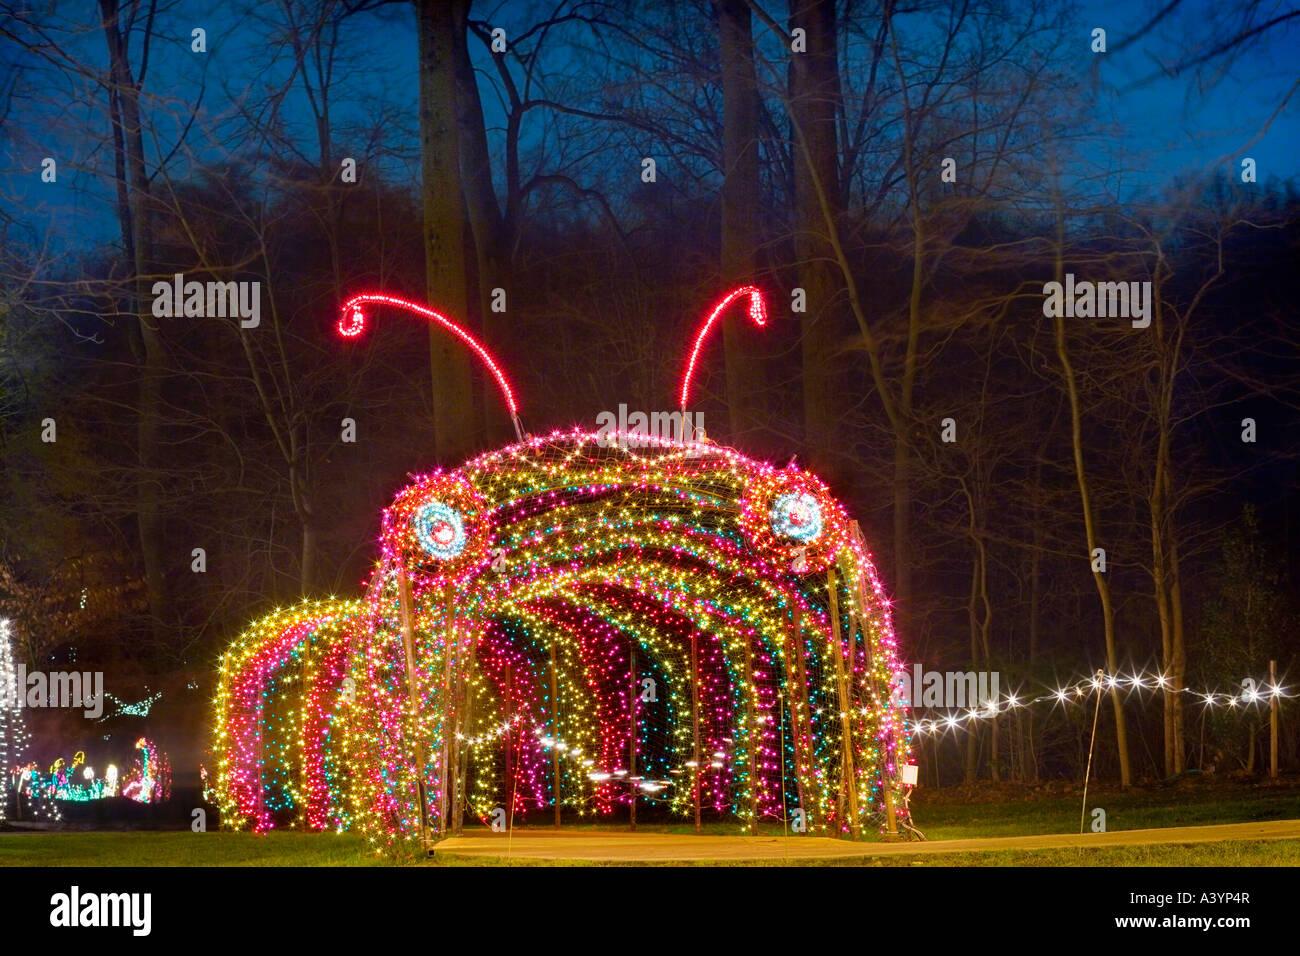 brookside gardens christmas lights display in wheaton md near washington dc usa caterpillar tunnel entrance - Dc Christmas Lights